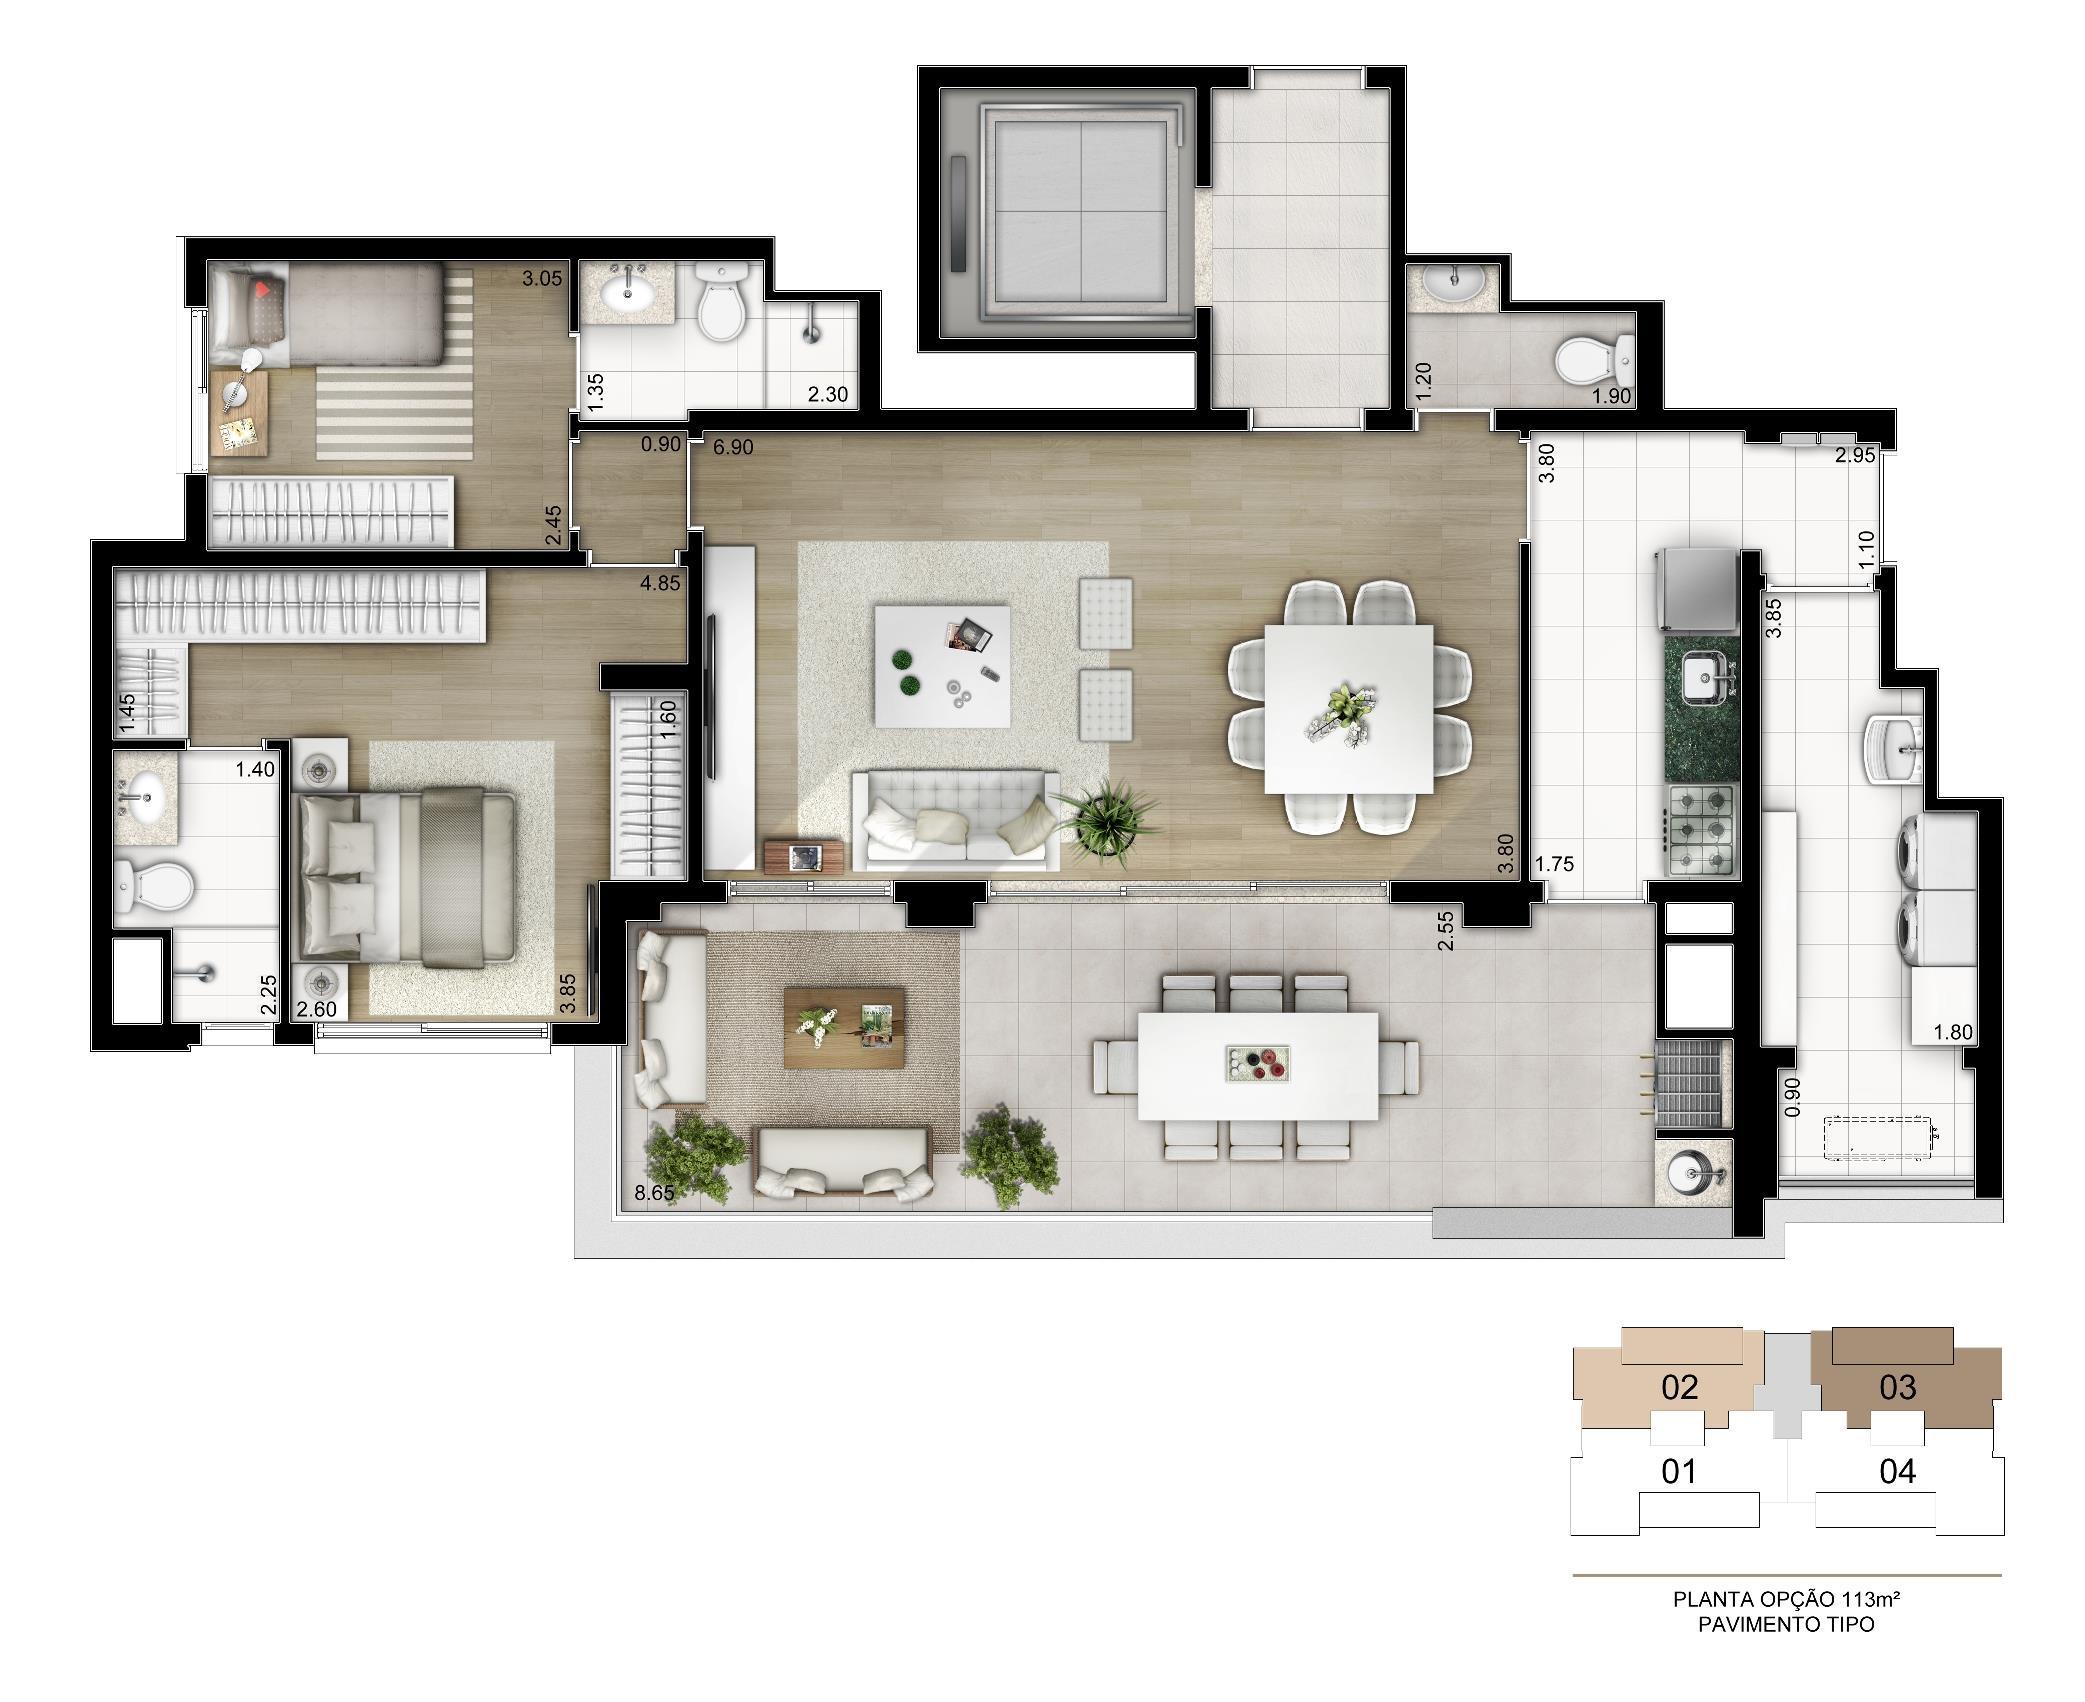 Planta Opção 113 m²   2 suítes com depósito privativo | Cyrela Legacy Vila Mariana – Apartamentona  Vila Mariana - São Paulo - São Paulo